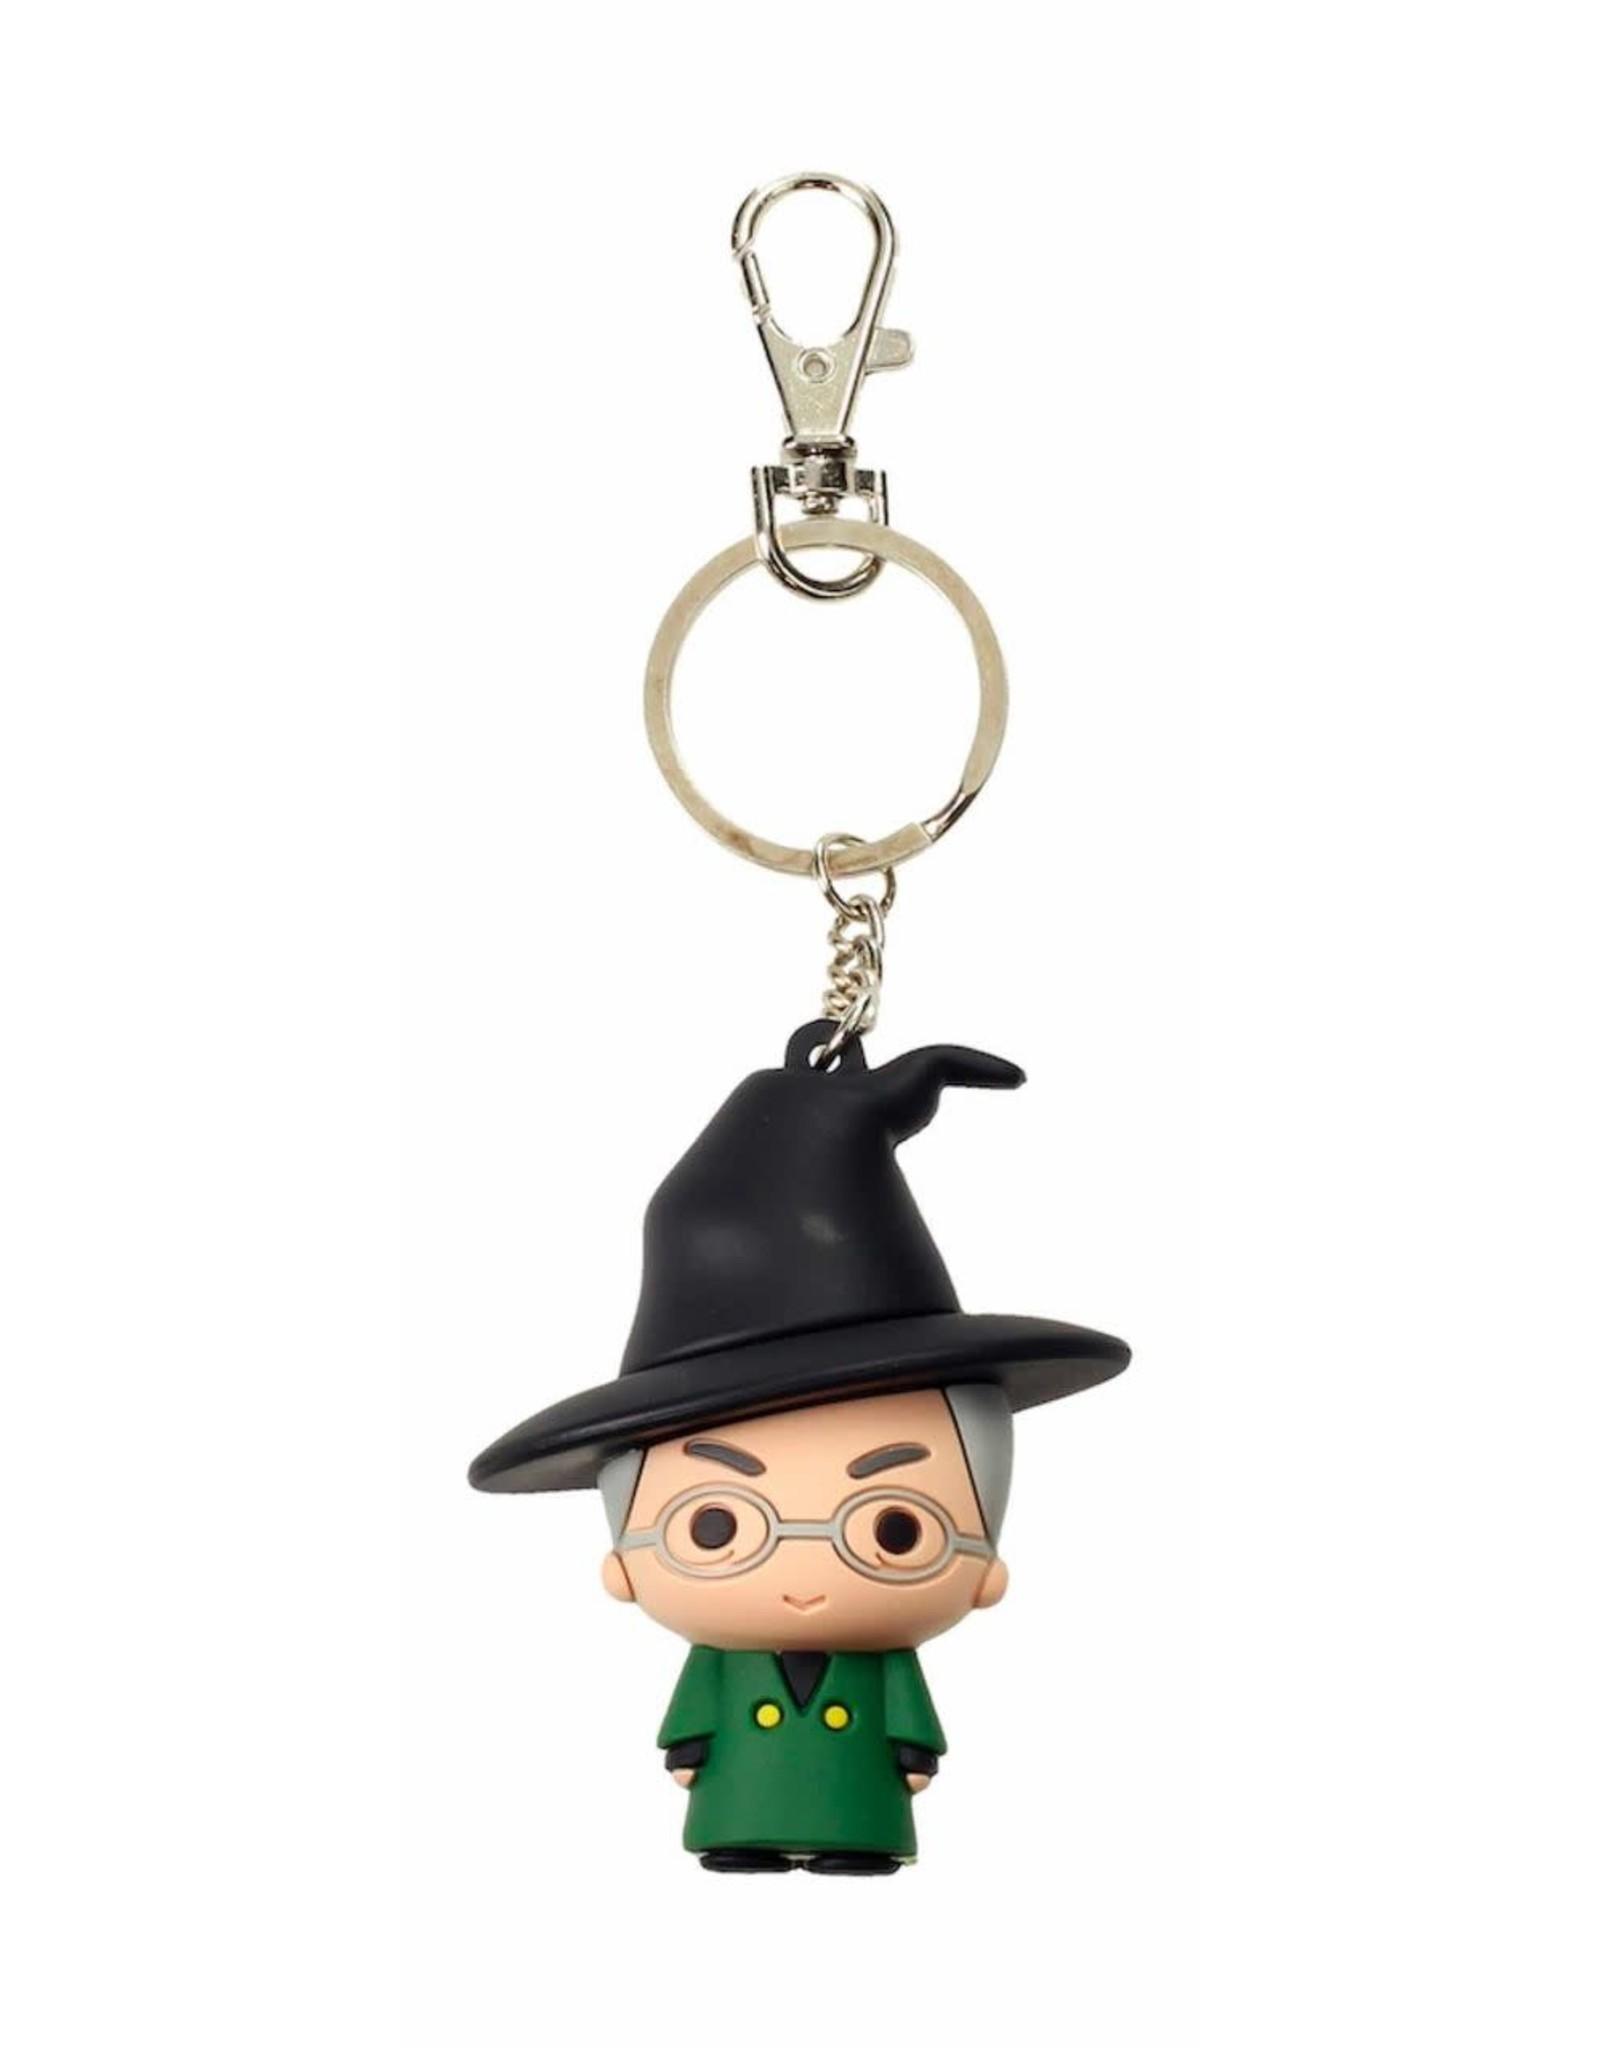 HARRY POTTER - Rubber Figure Keychain - Mc Gonagall